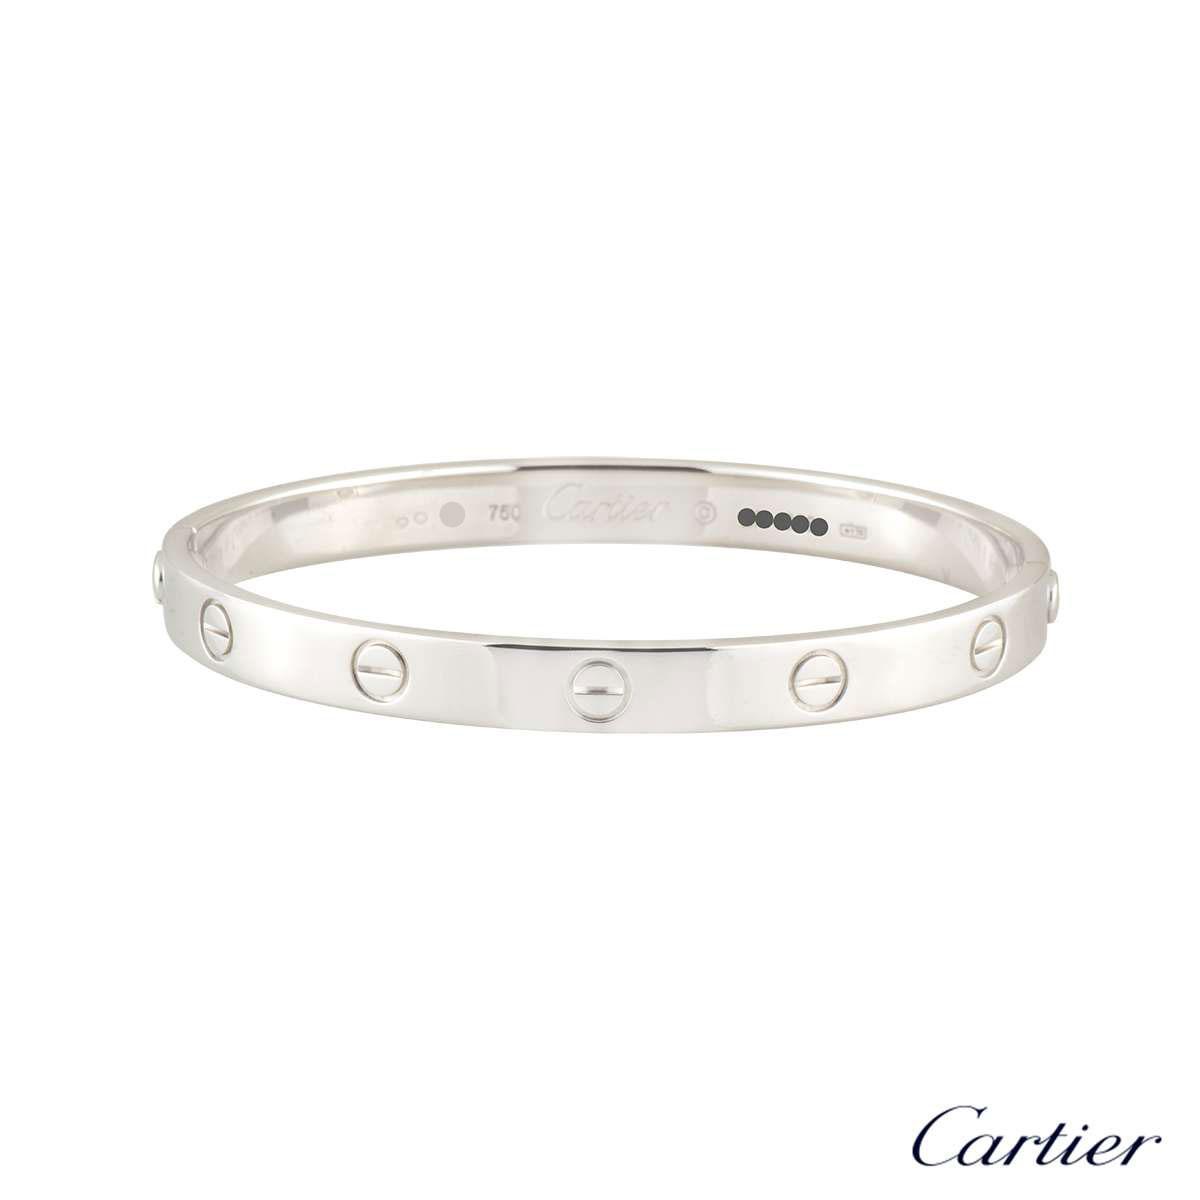 Cartier White Gold Plain Love Bangle Size 16 B6035416